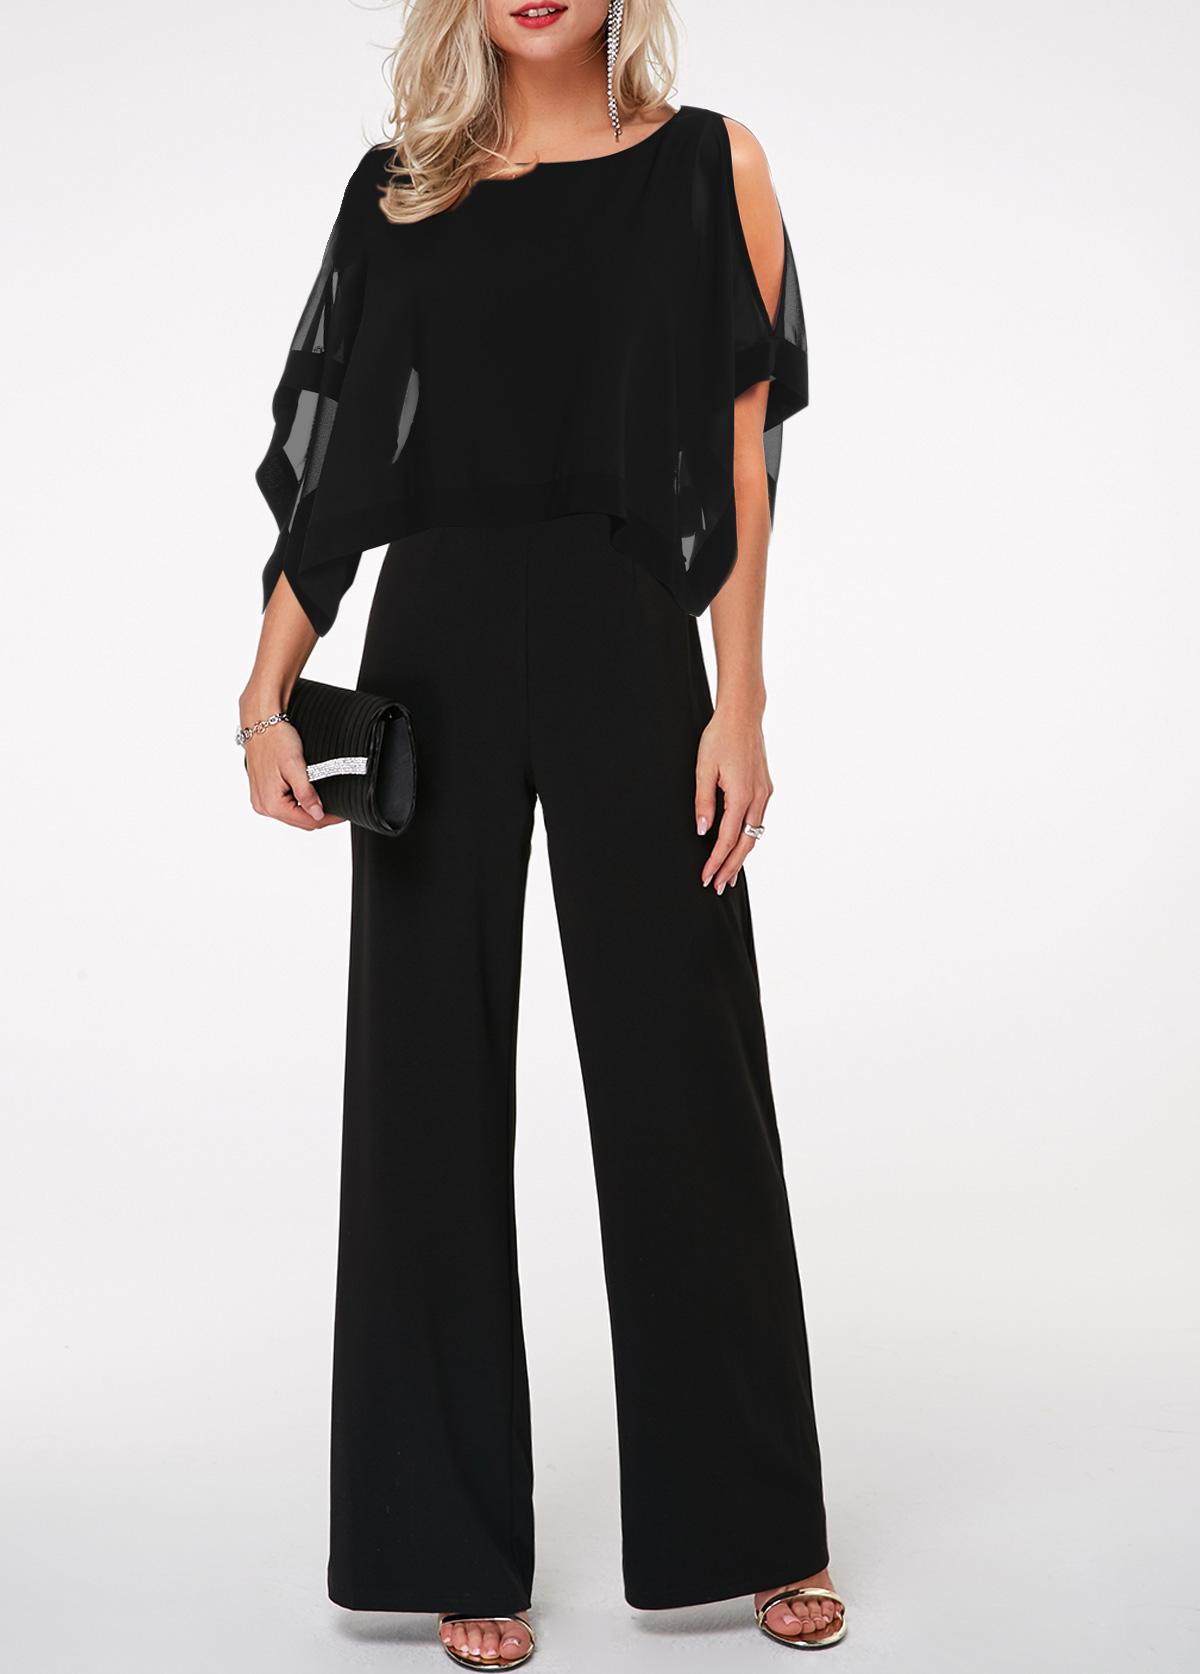 Cape Shoulder Three Quarter Sleeve Black Jumpsuit